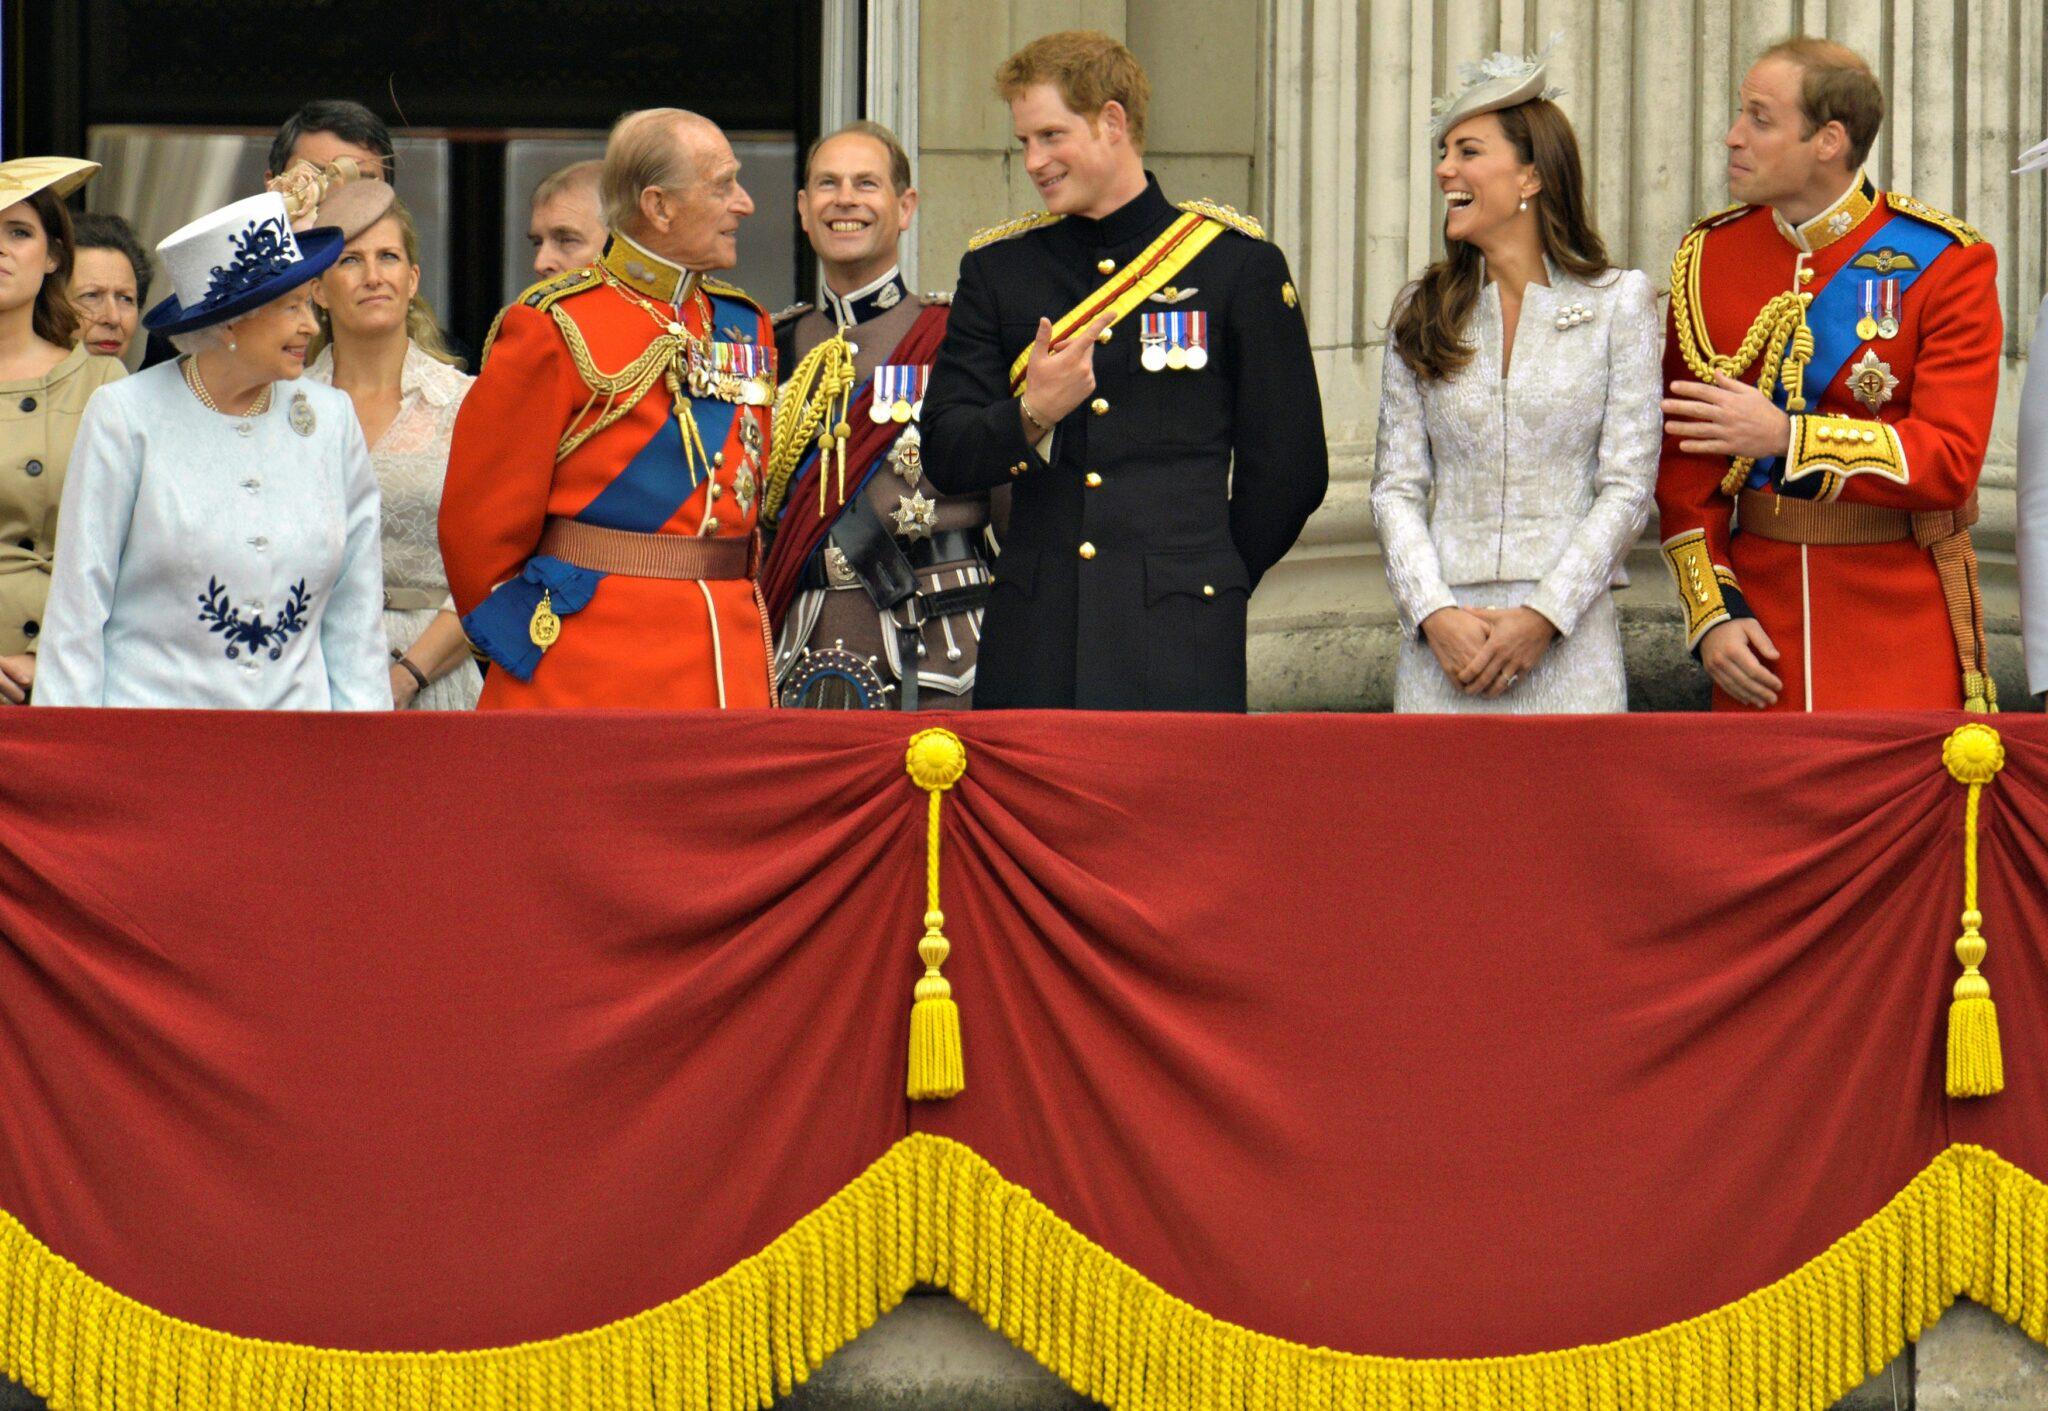 Královna Alžběta, princ Philip, princ Harry, princ William s manželkou Kate, vévodkyní z Cambridge , Catherine v Buckinghamském paláci, 2014